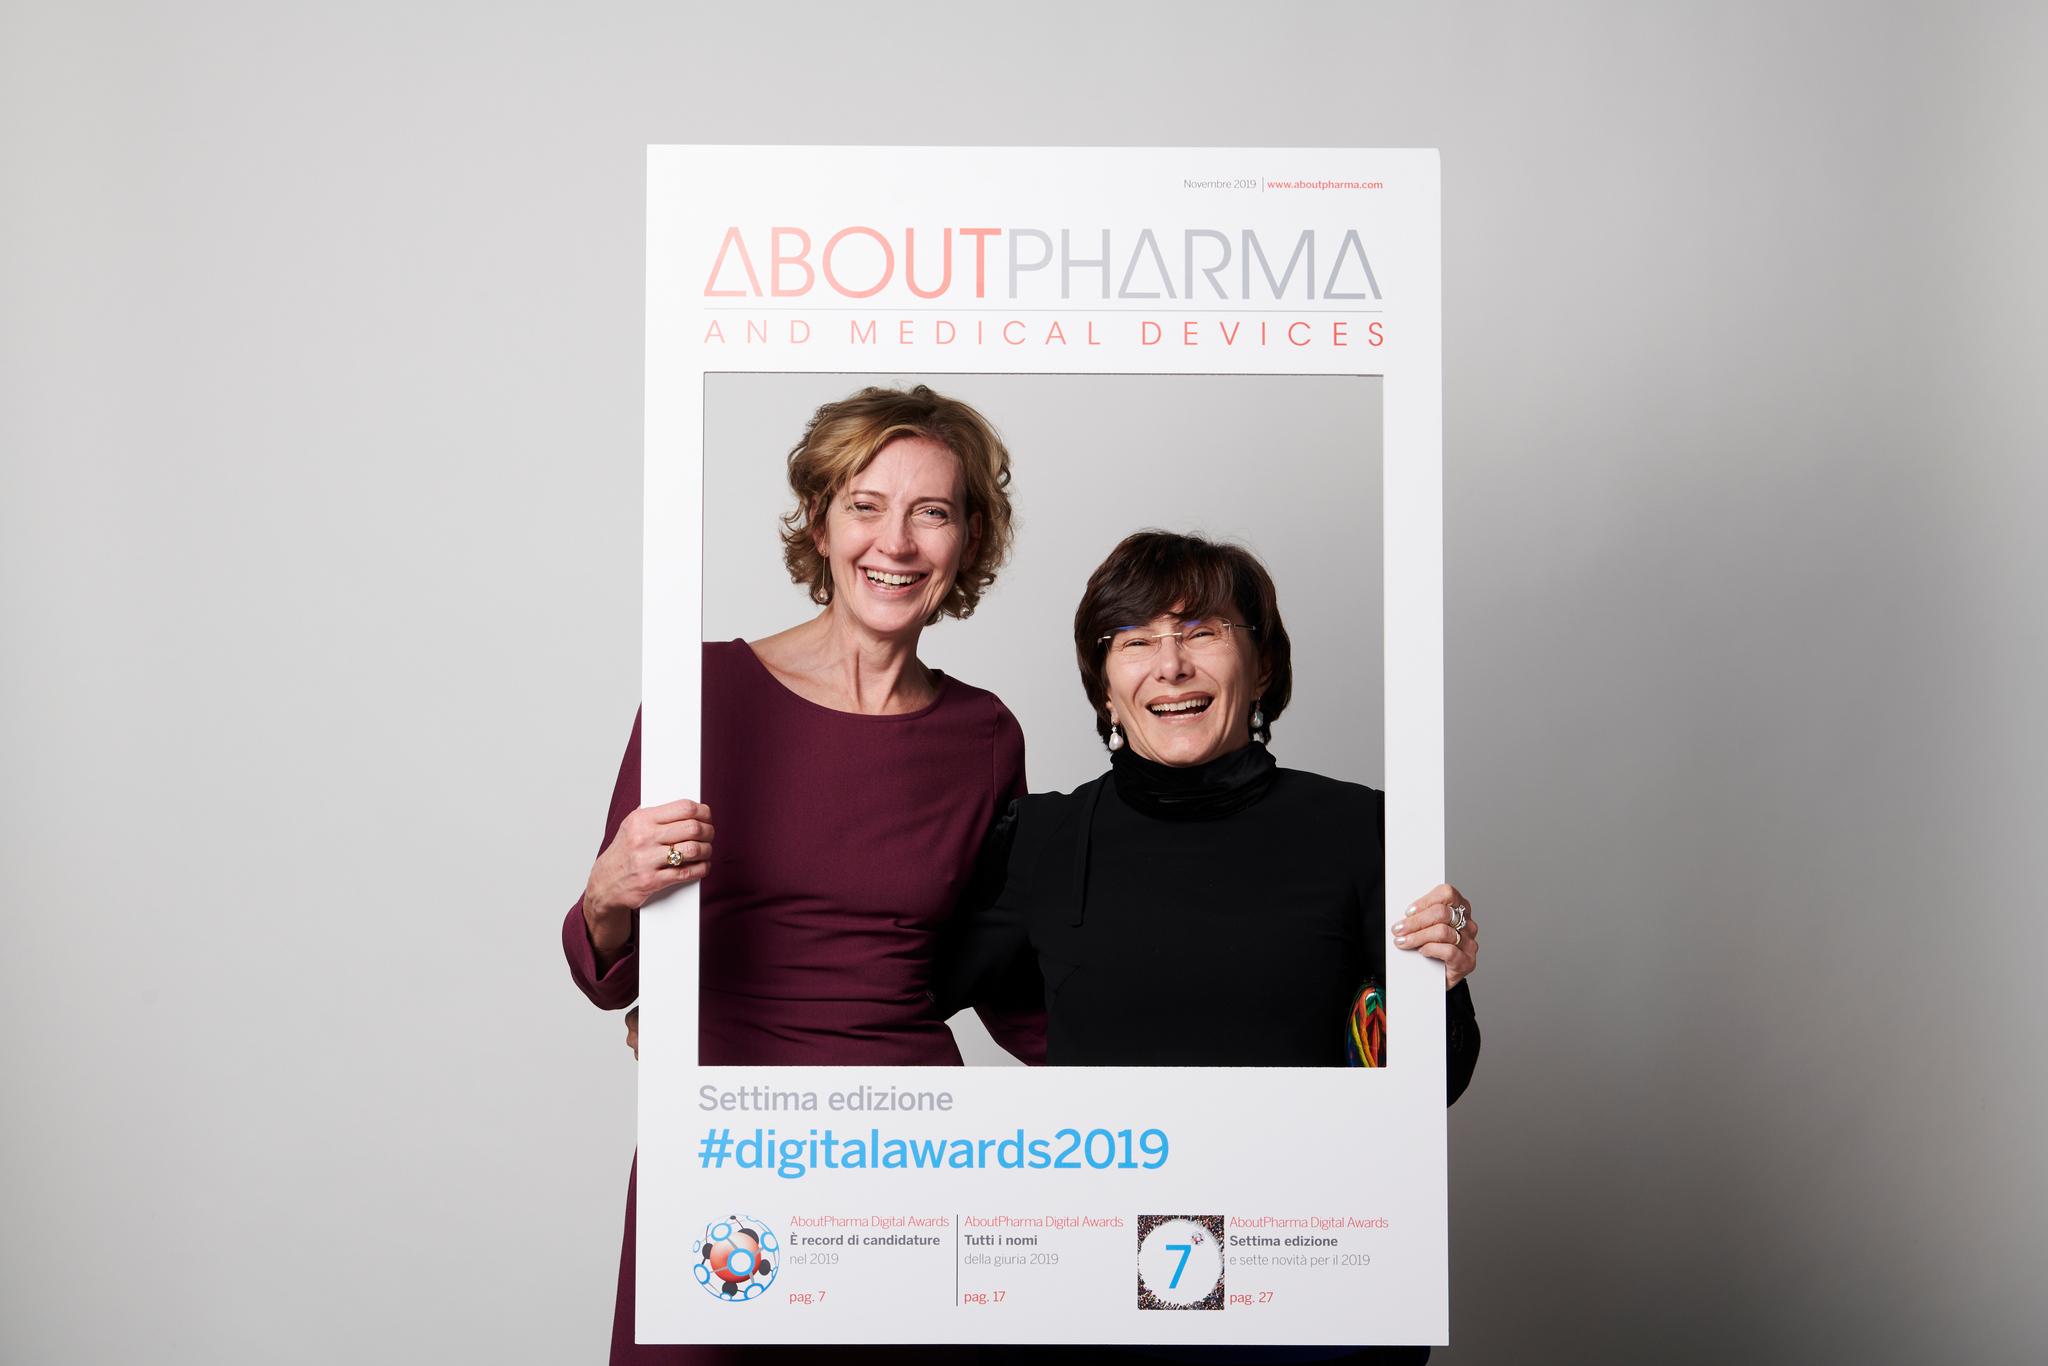 Photobooth AboutPharma Digital Awards 2019_47